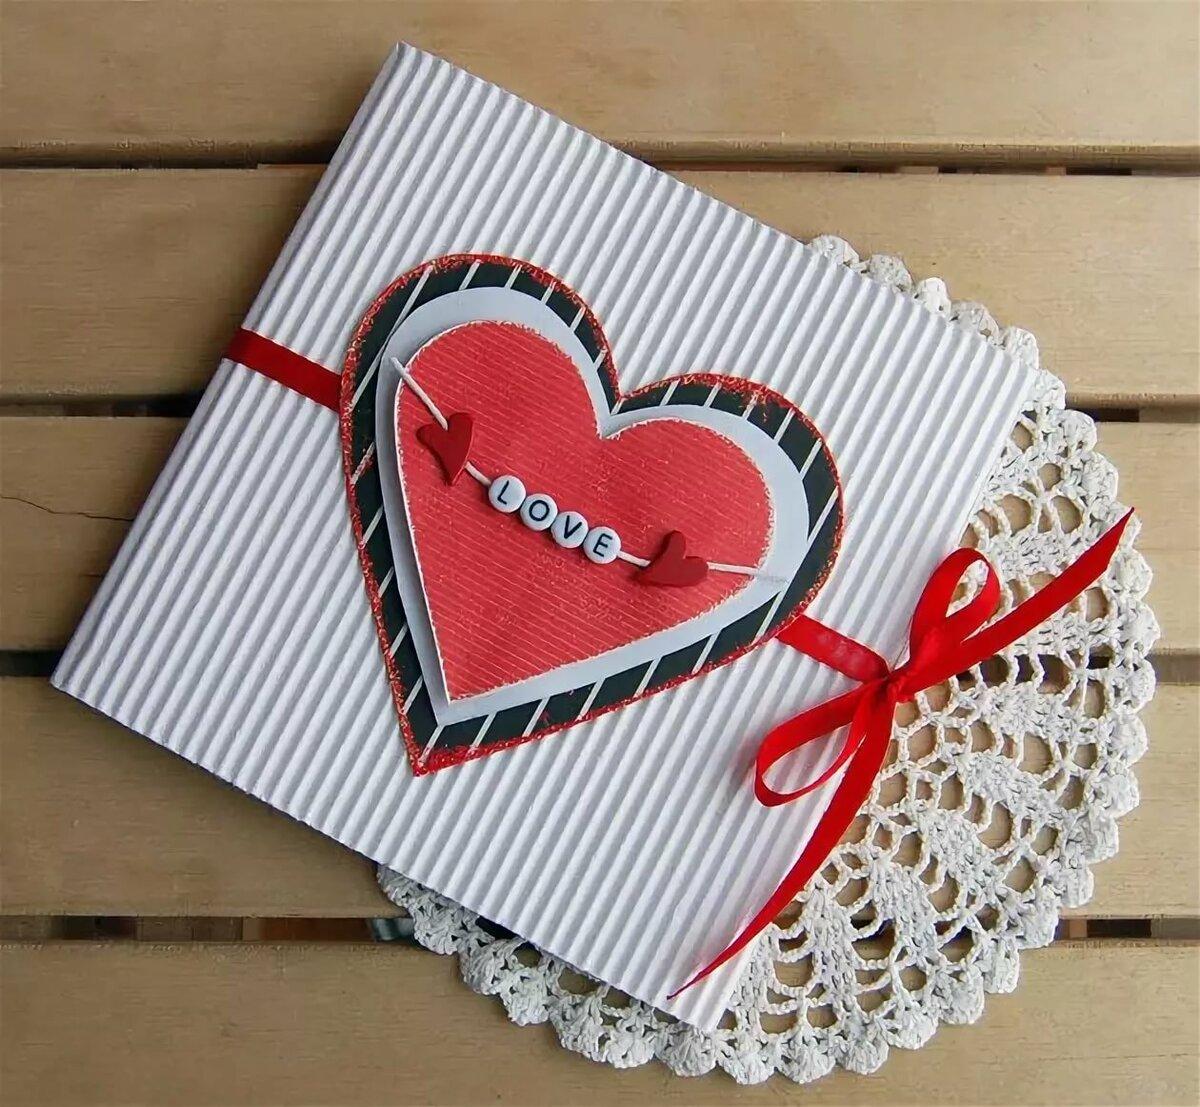 Марта, открытки на день святого валентина руки